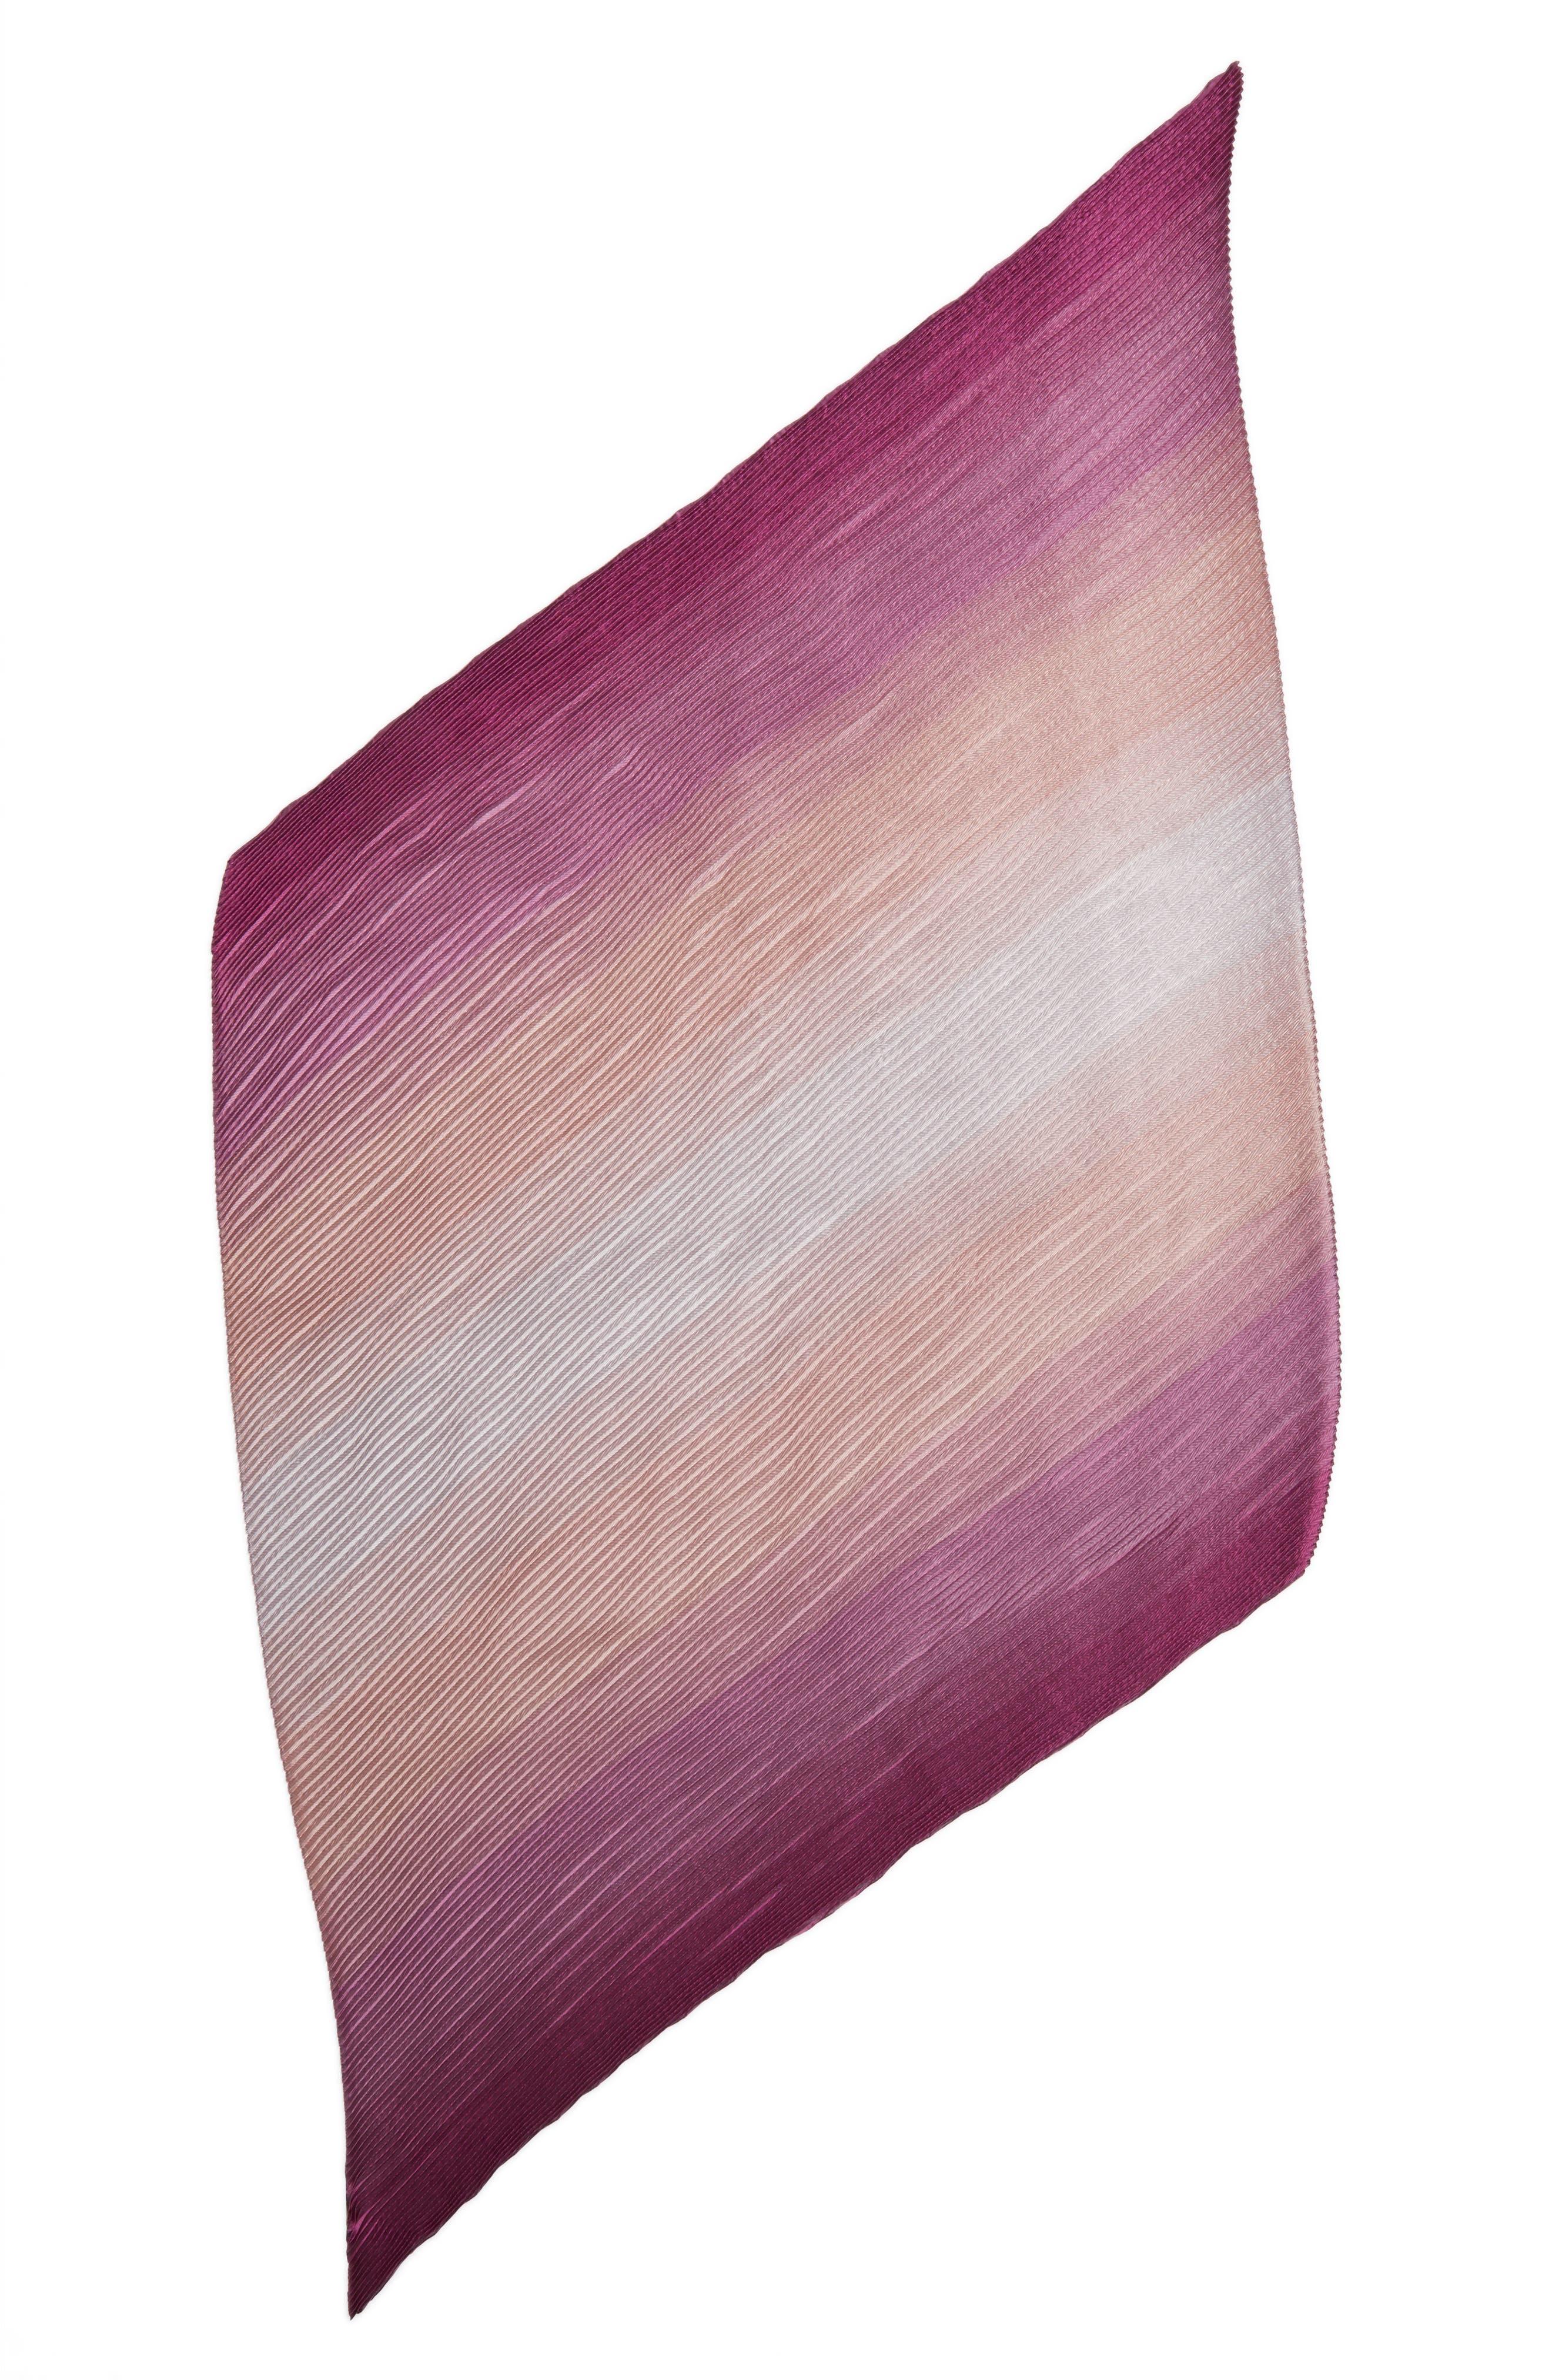 Herringbone Plissé Scarf,                             Alternate thumbnail 2, color,                             Fuchsia Multi